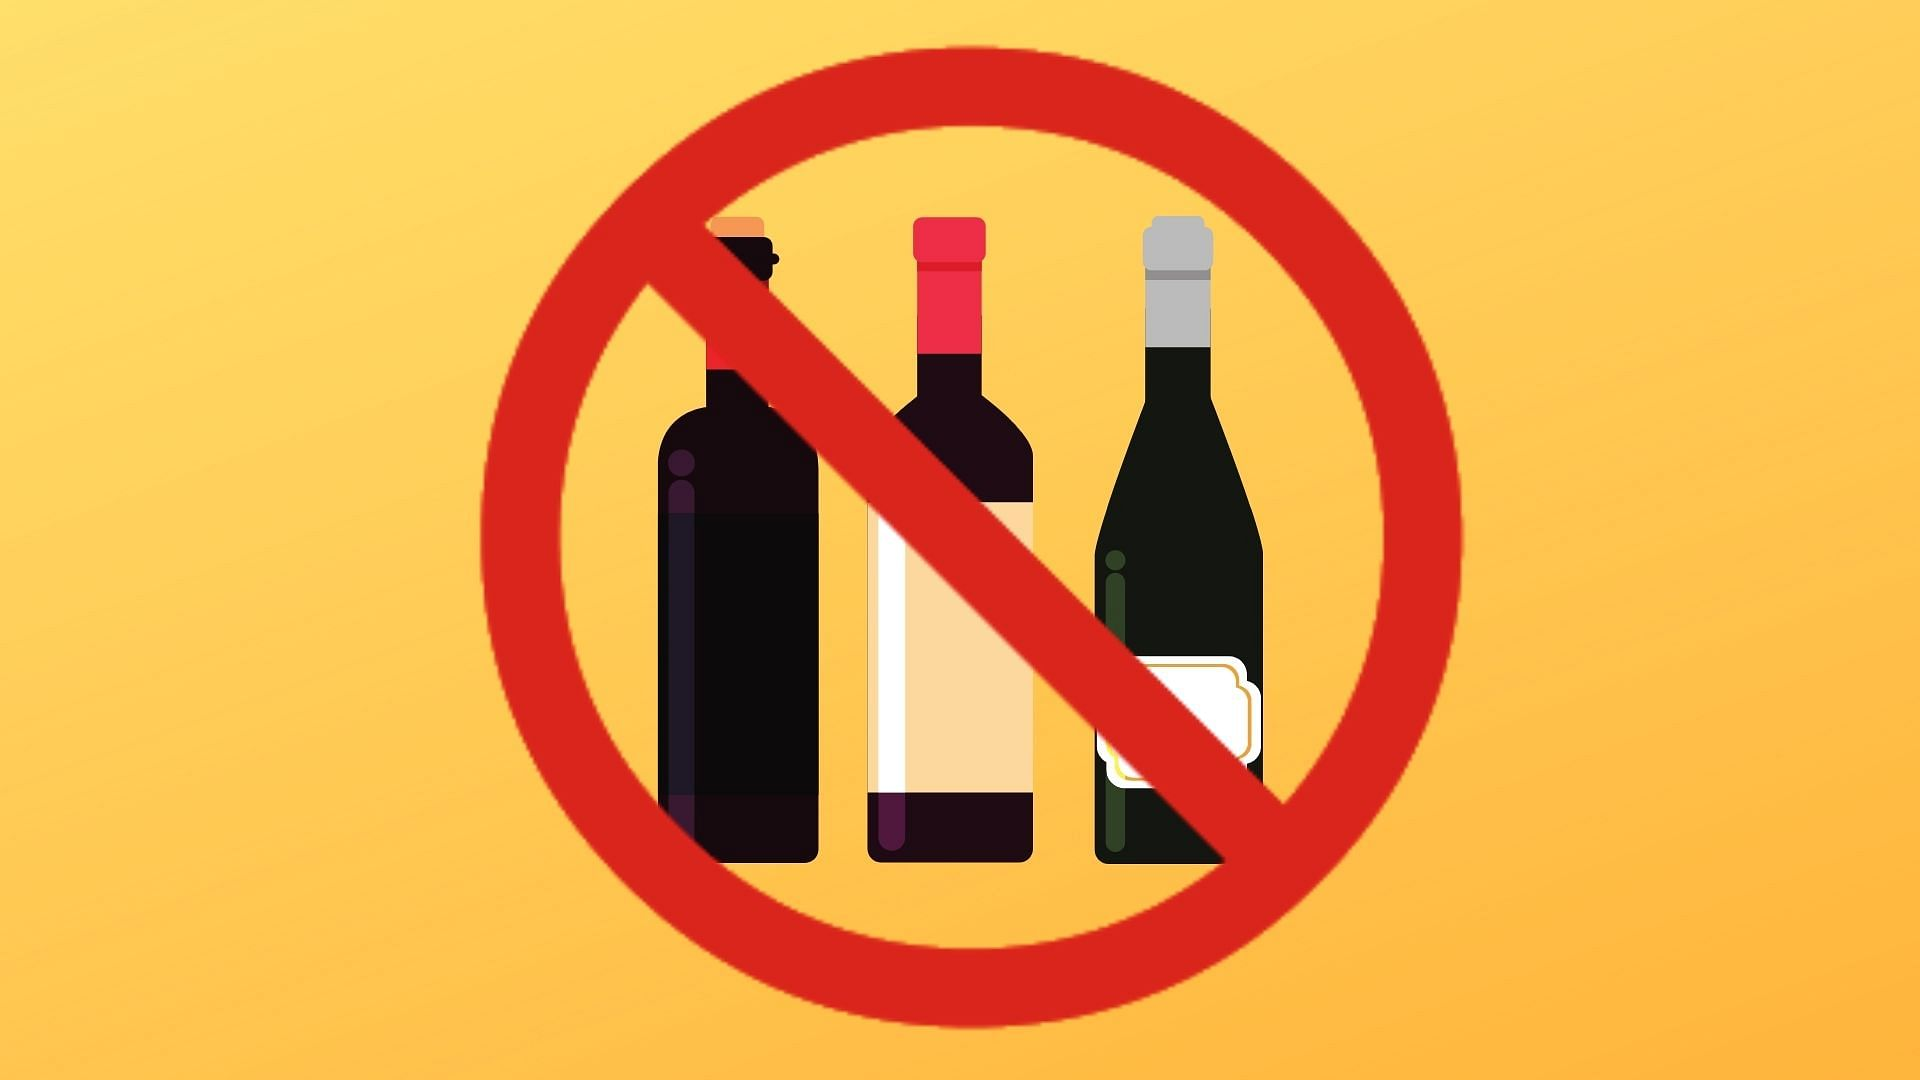 liquor ban ads